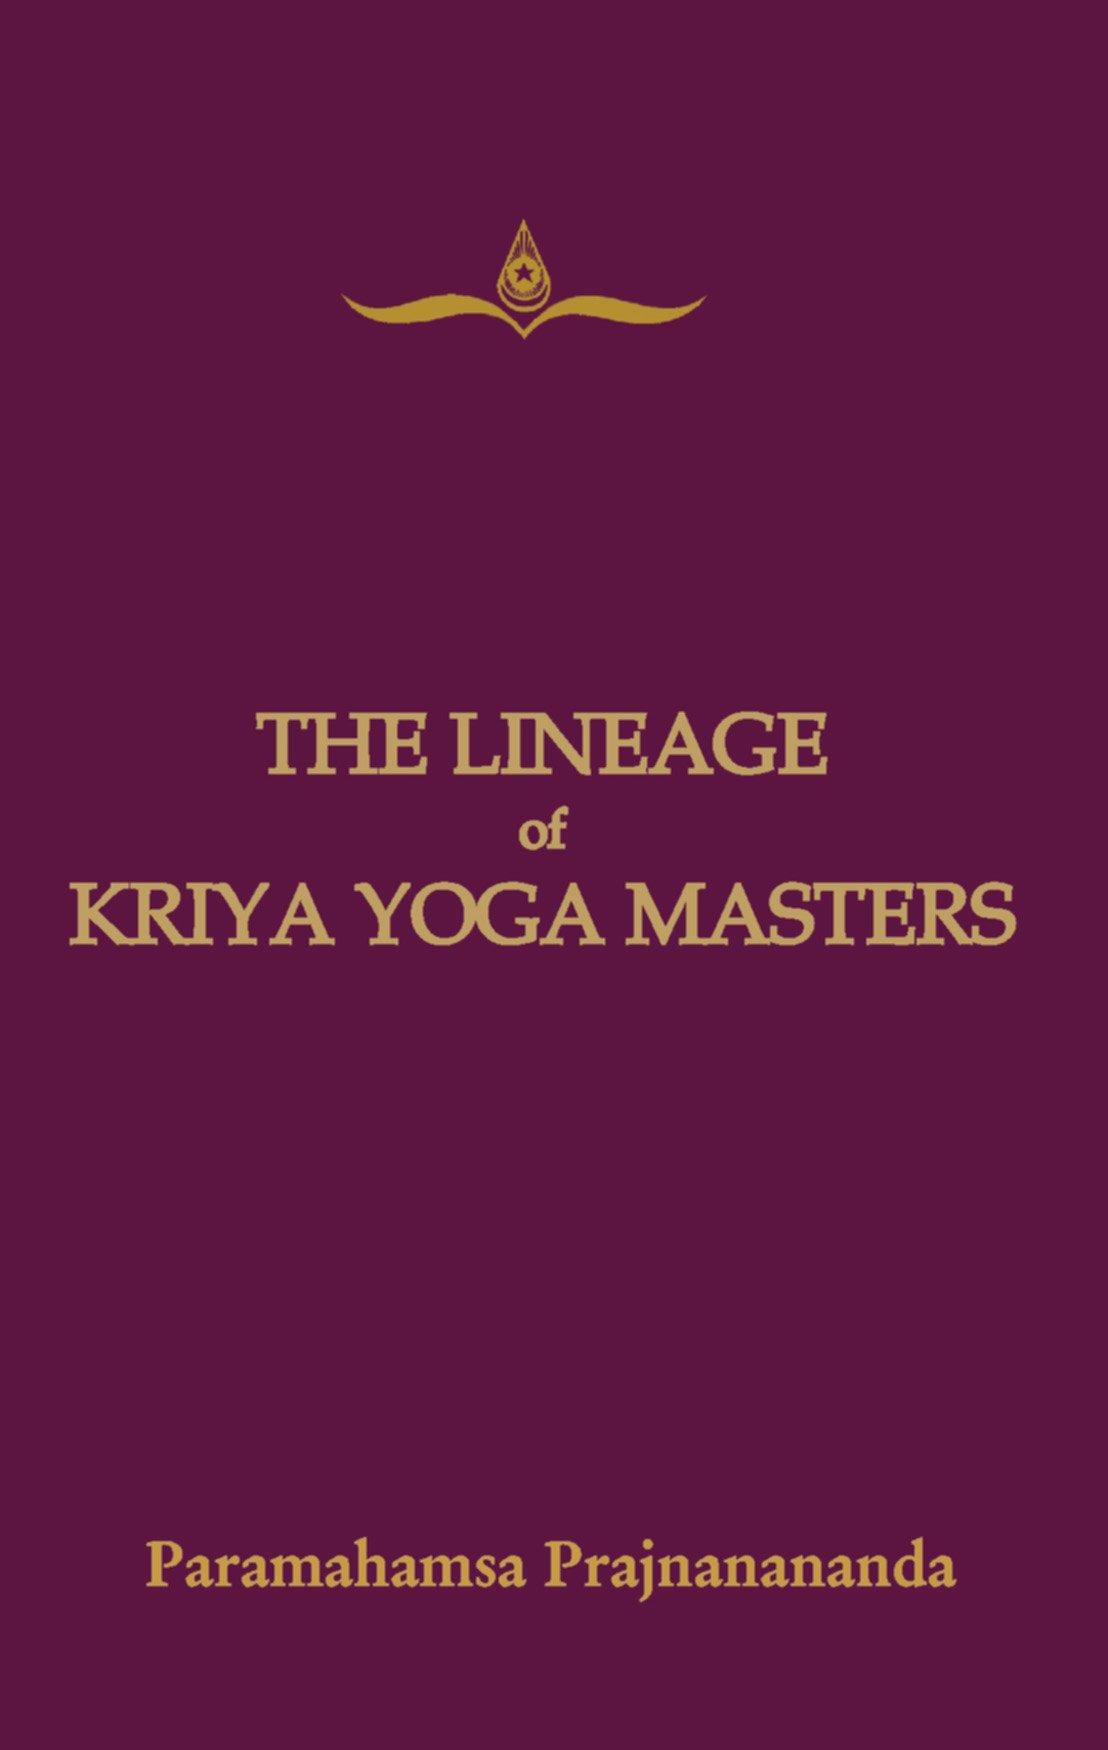 The Lineage Of Kriya Yoga Masters Paramahamsa Prajnanananda 9788178990897 Amazon Com Books